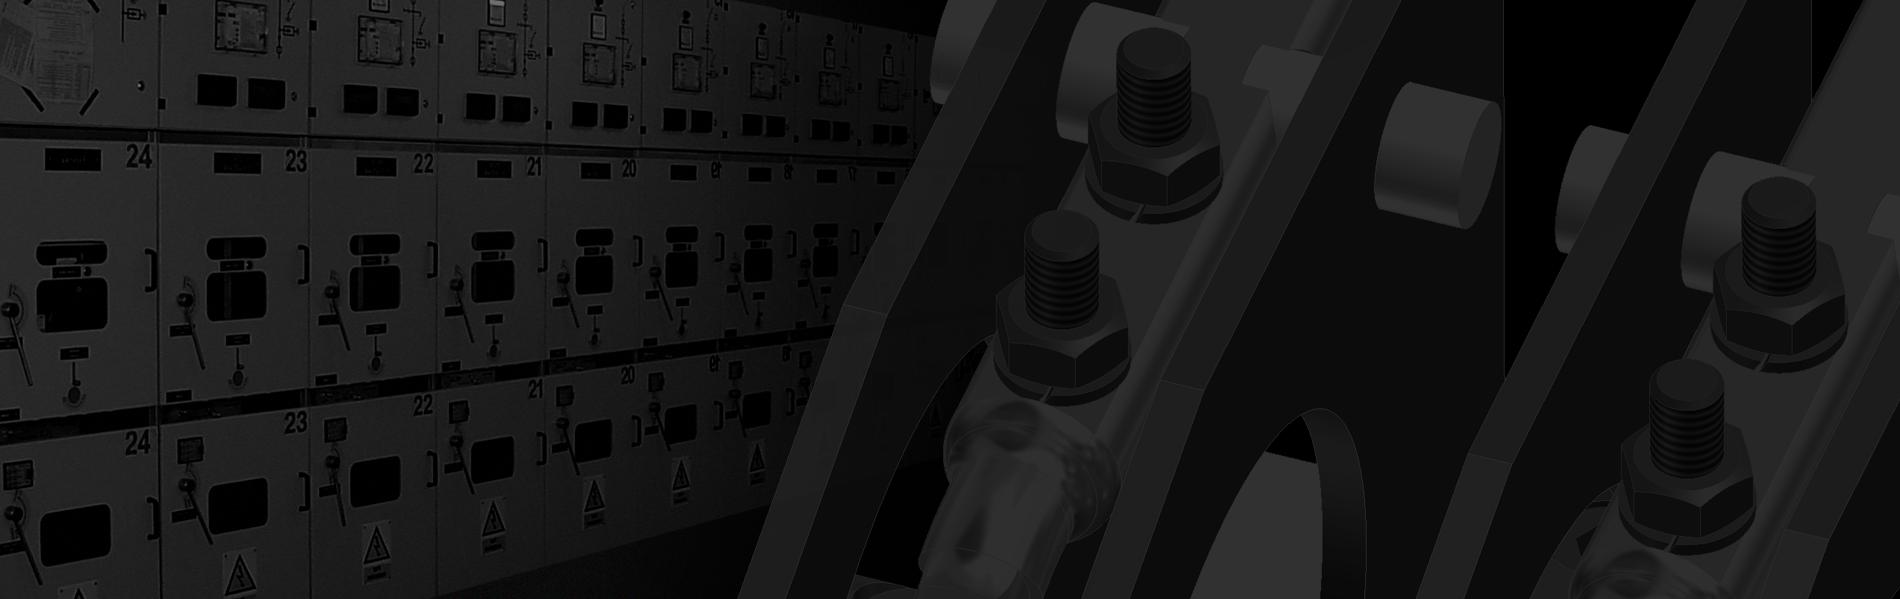 baner-3-aparaty-edjan